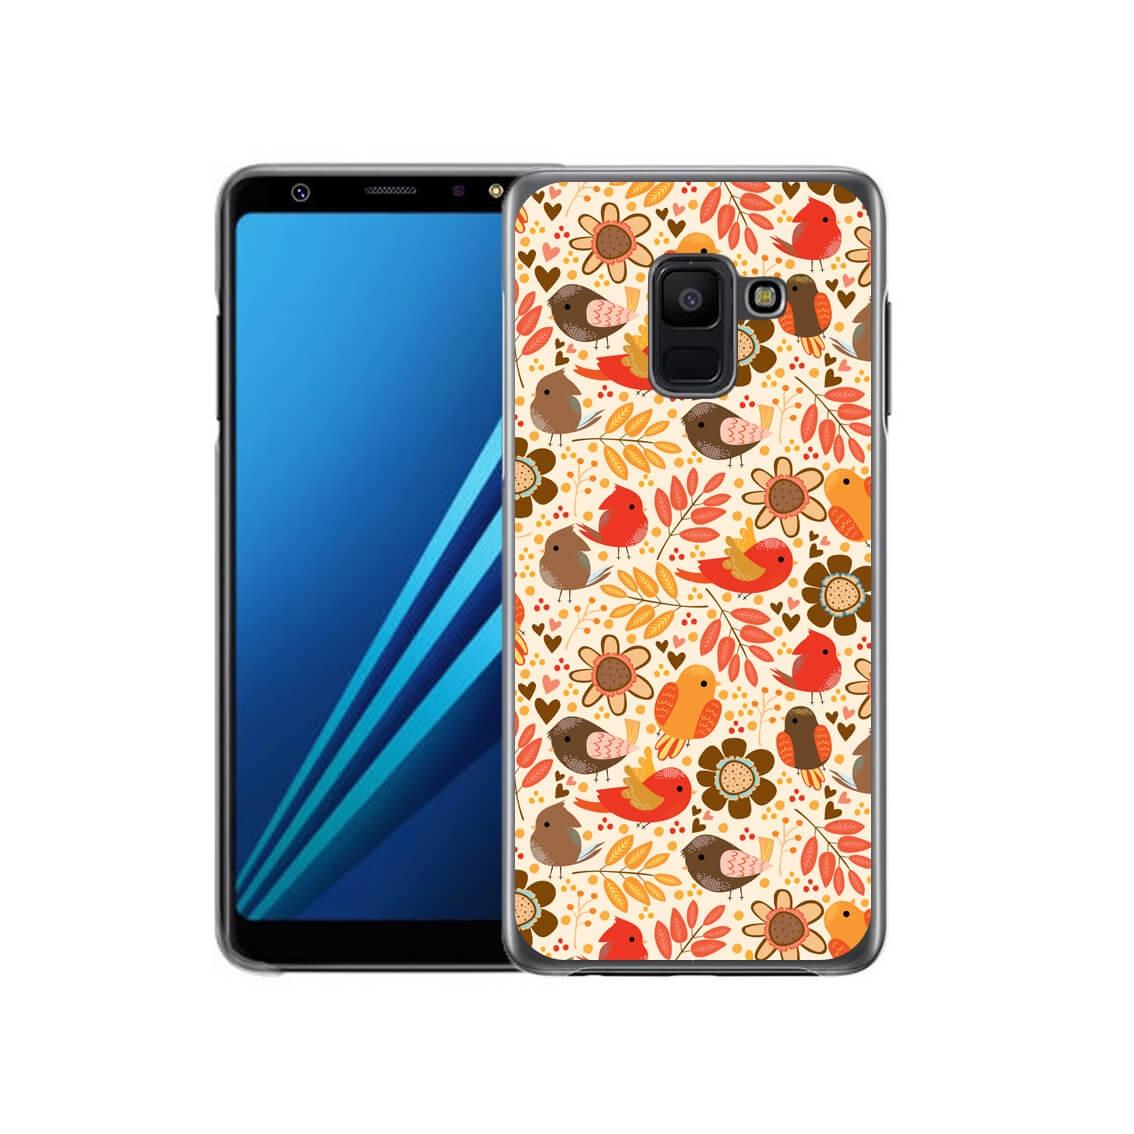 FORCELL MY ART kryt Samsung Galaxy A6 (A600) BIRDS (004) (004)